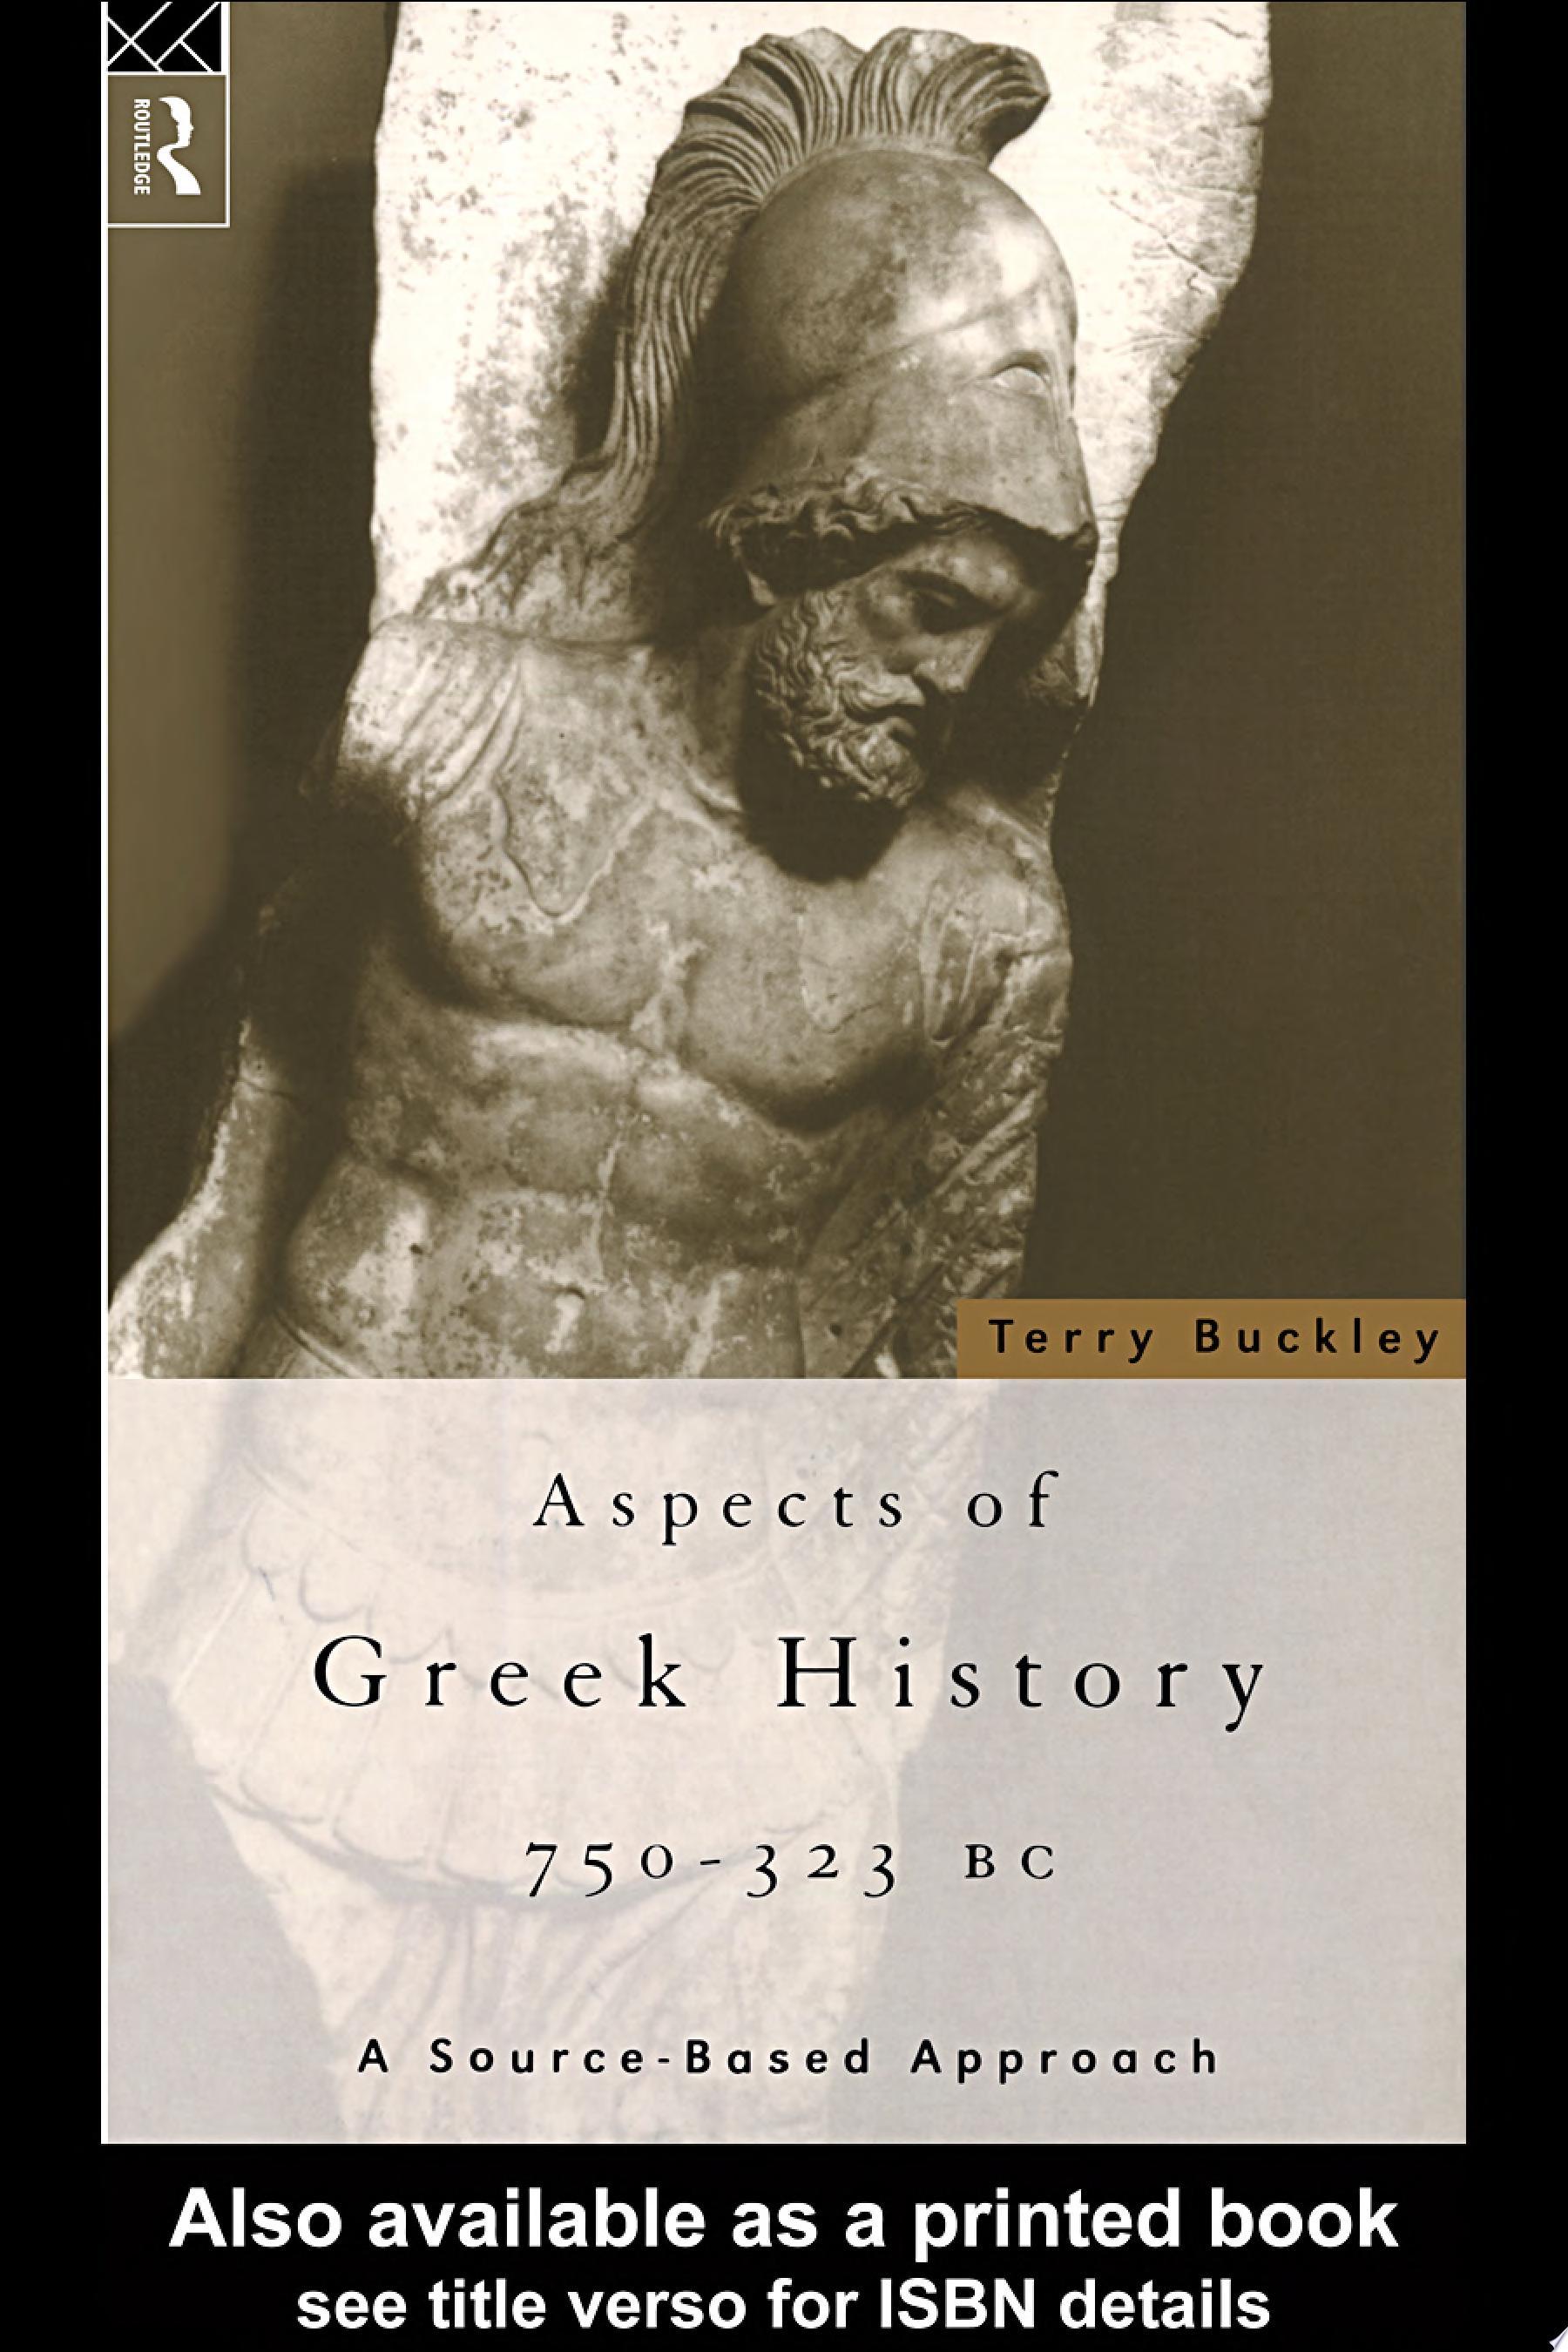 Aspects of Greek History